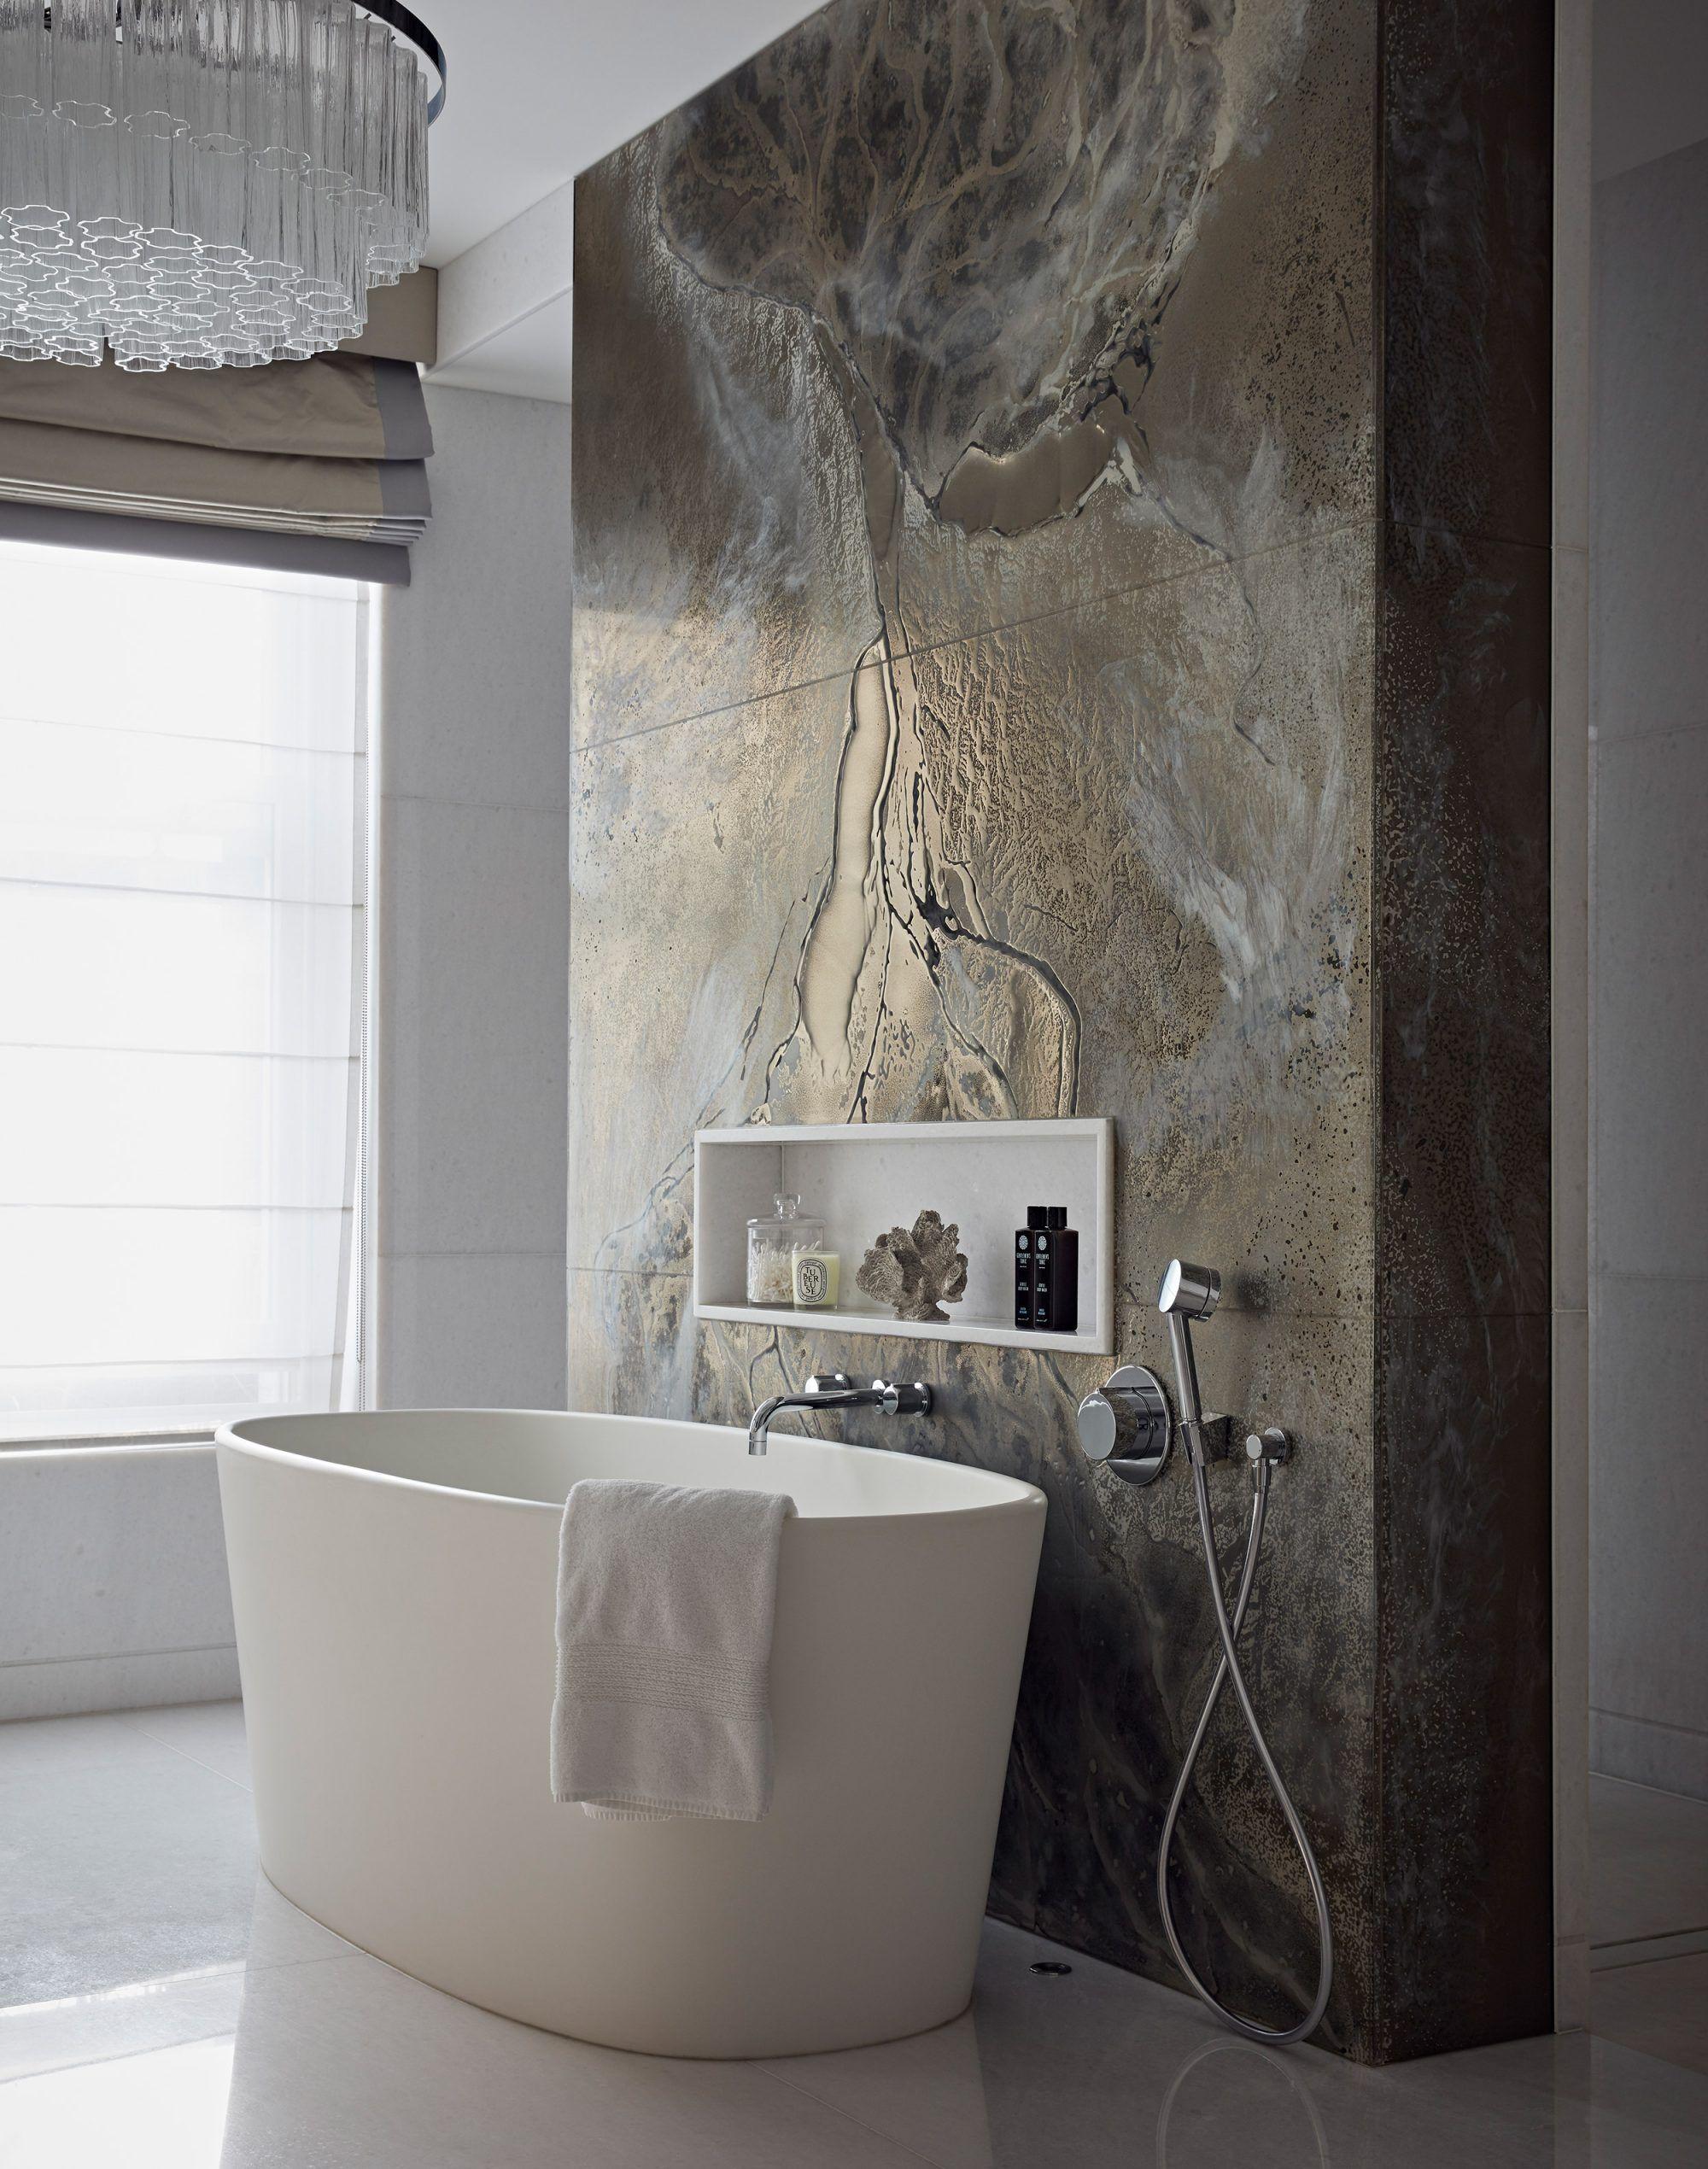 5 Tips For Home Decor In 2020 Bathroom Interior Design Bathroom Design Modern Bathroom